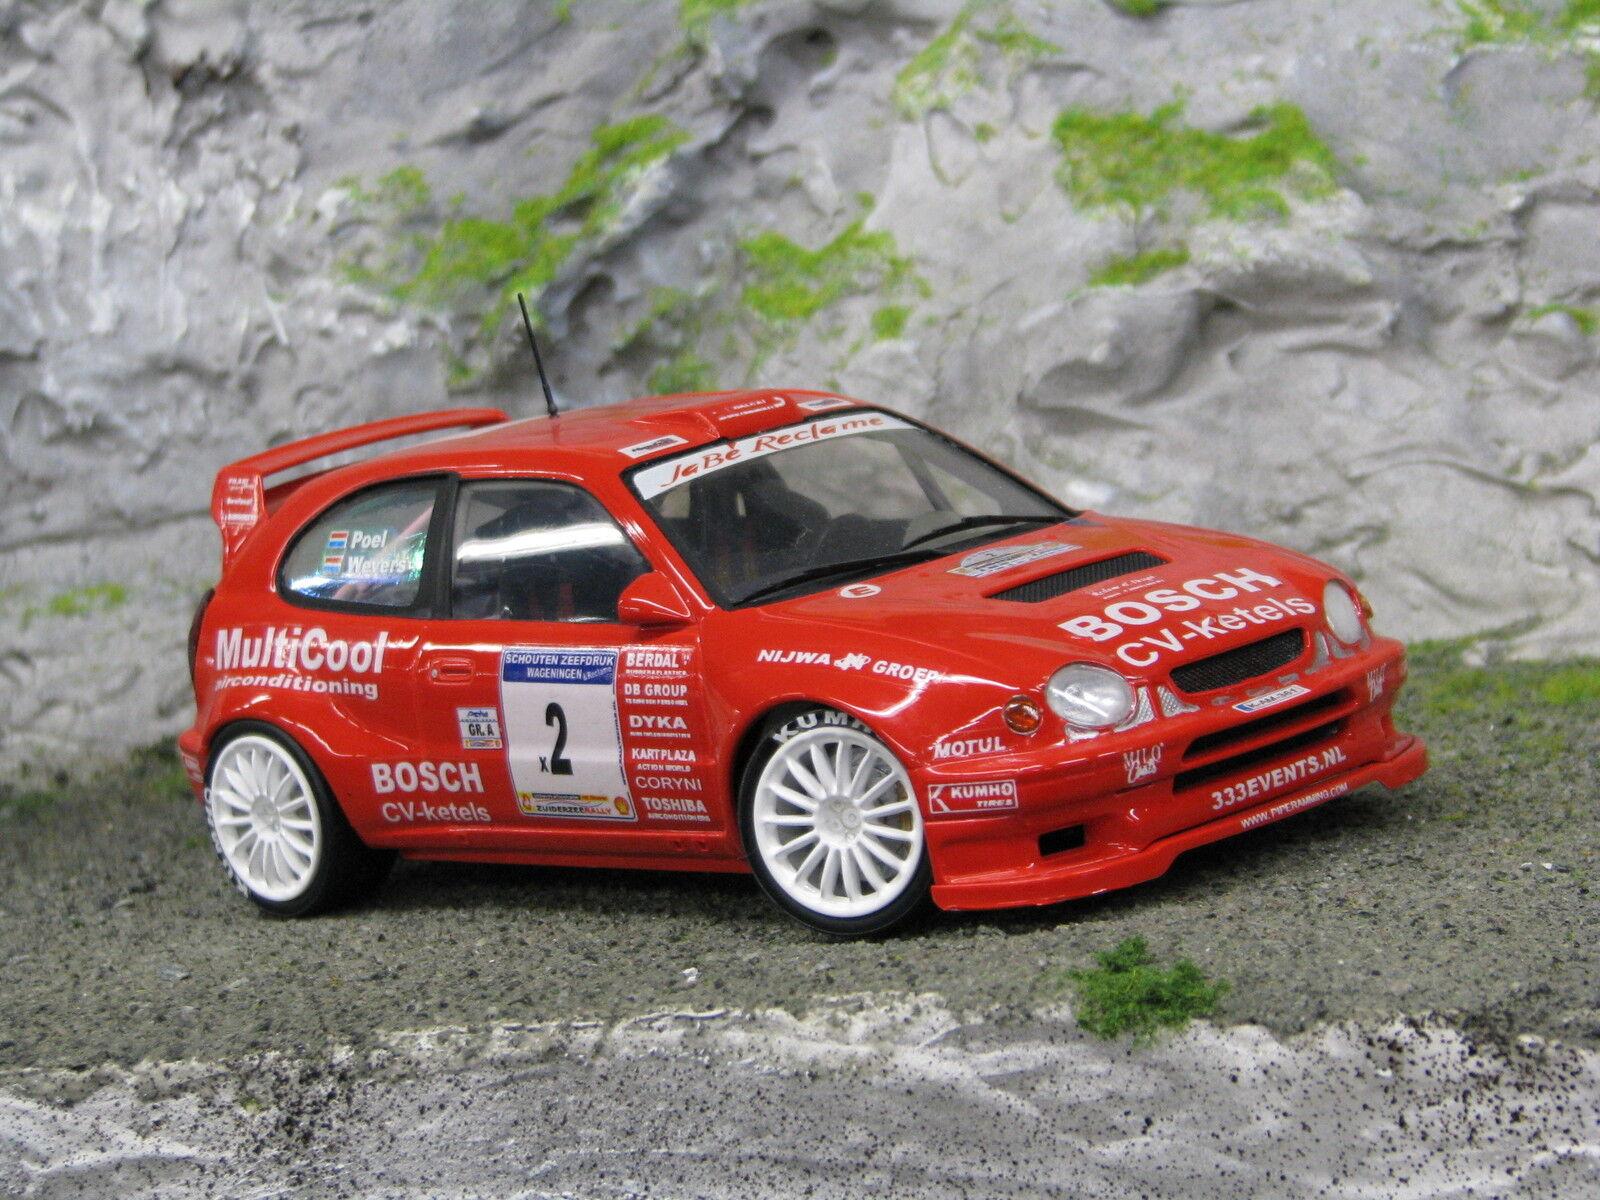 QSP Toyota Corolla WRC 1998 1:24  2 Wevers / Poel Zuiderzee Rally 2004